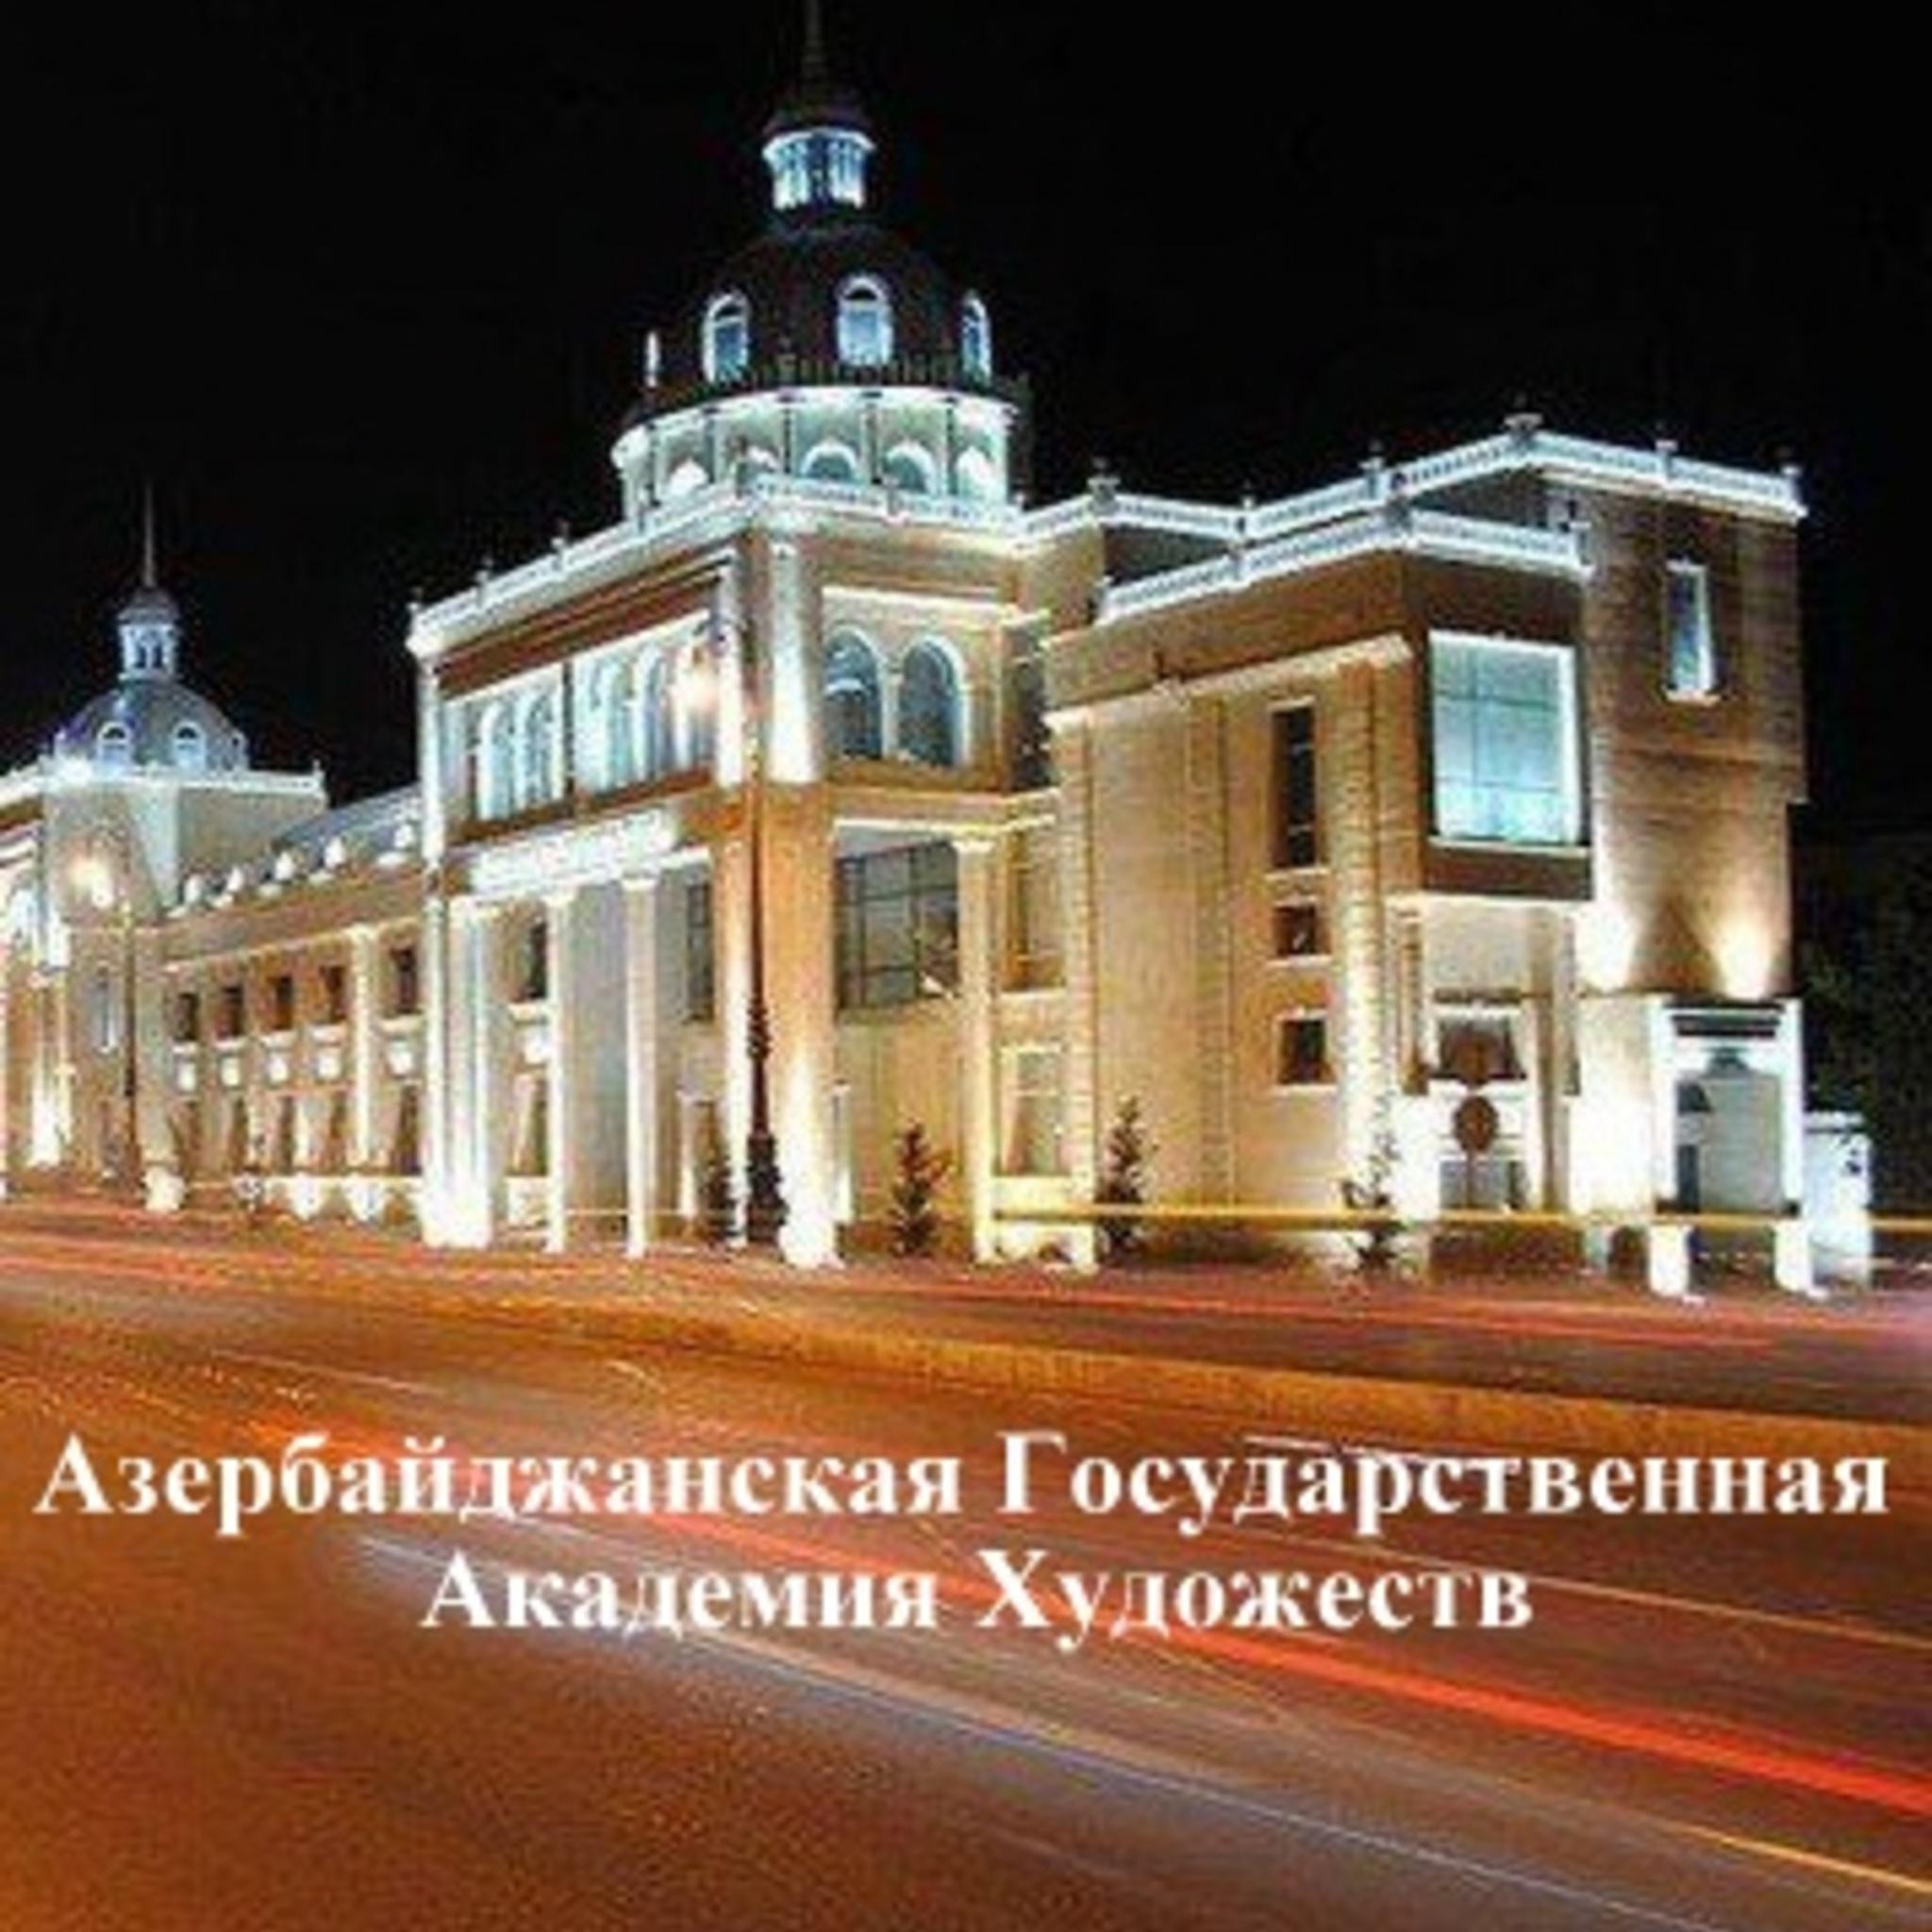 Azerbaijan State Academy of Arts